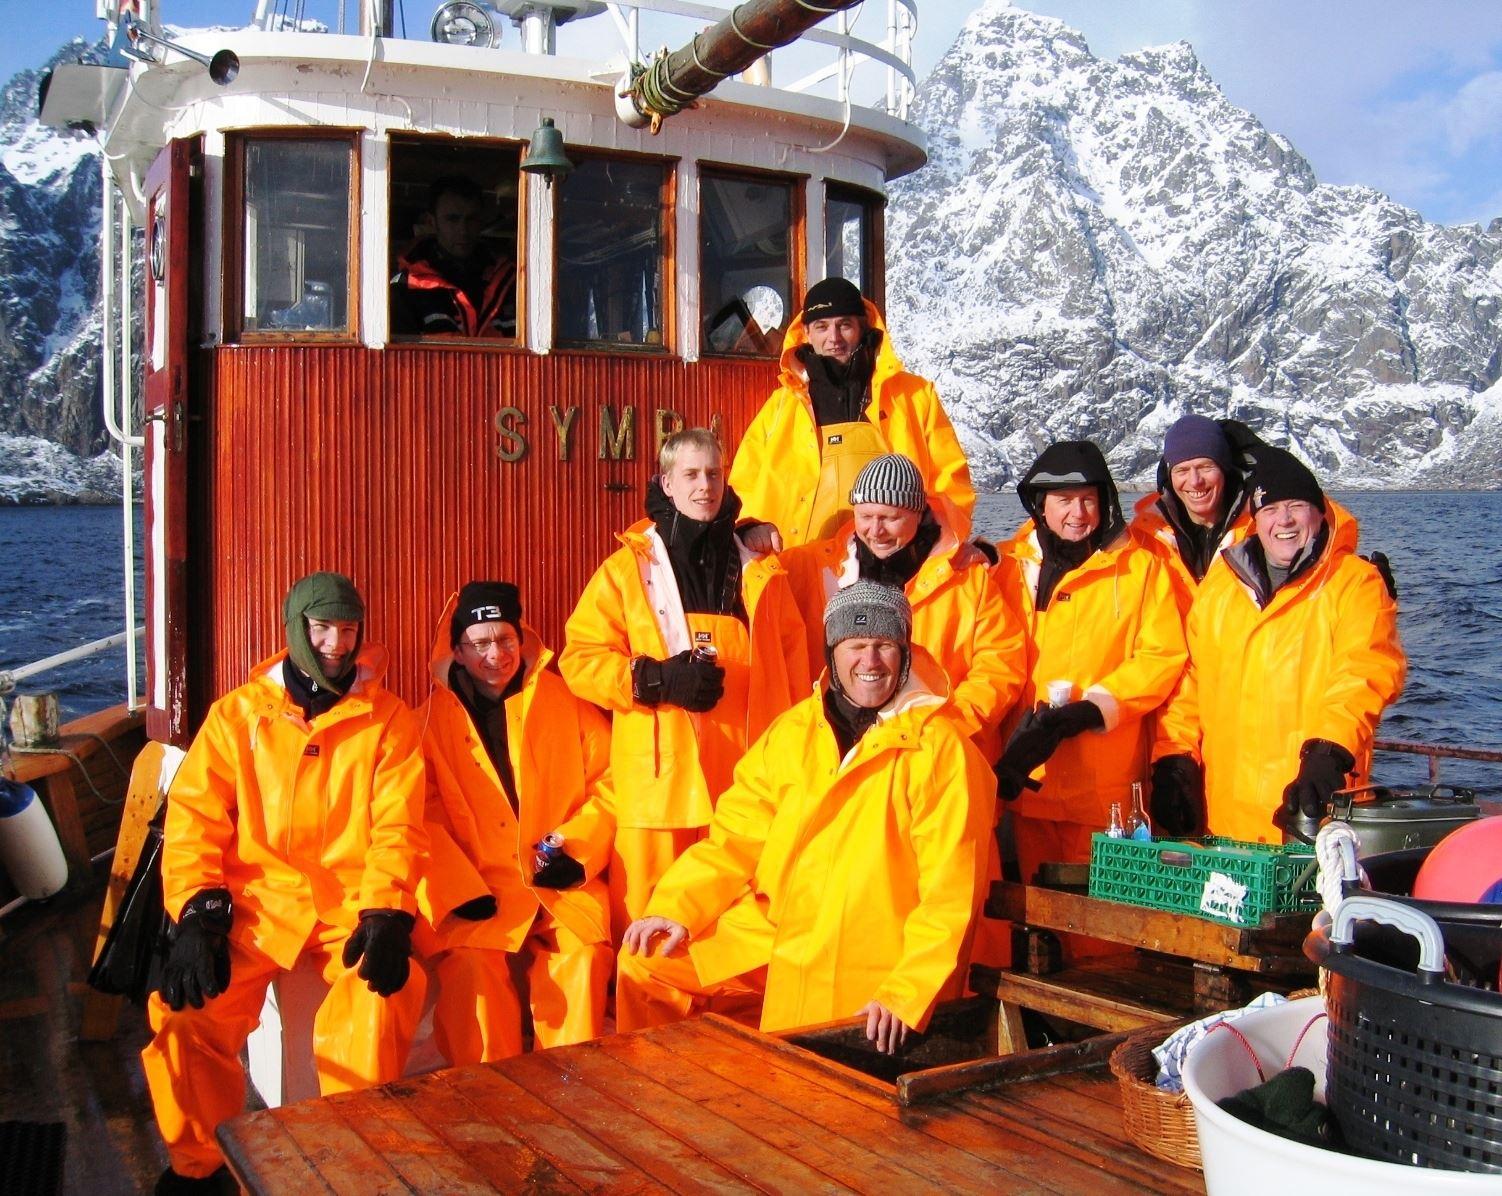 Fishing trip from Svolvær